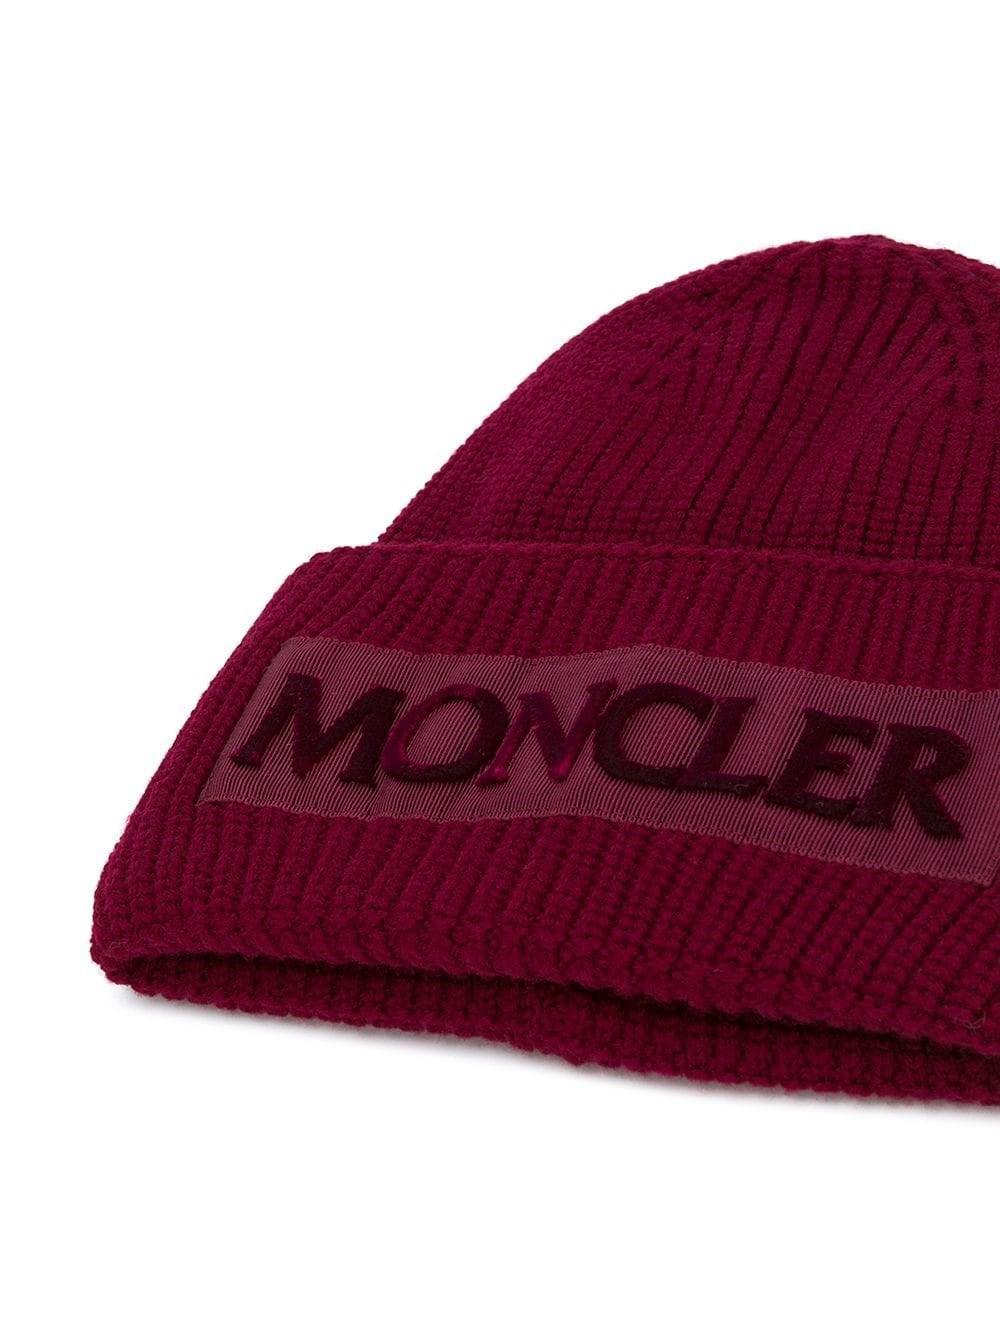 Lyst - Moncler Women s 9960500979c4459 Burgundy Wool Hat in Red 740549695d1b